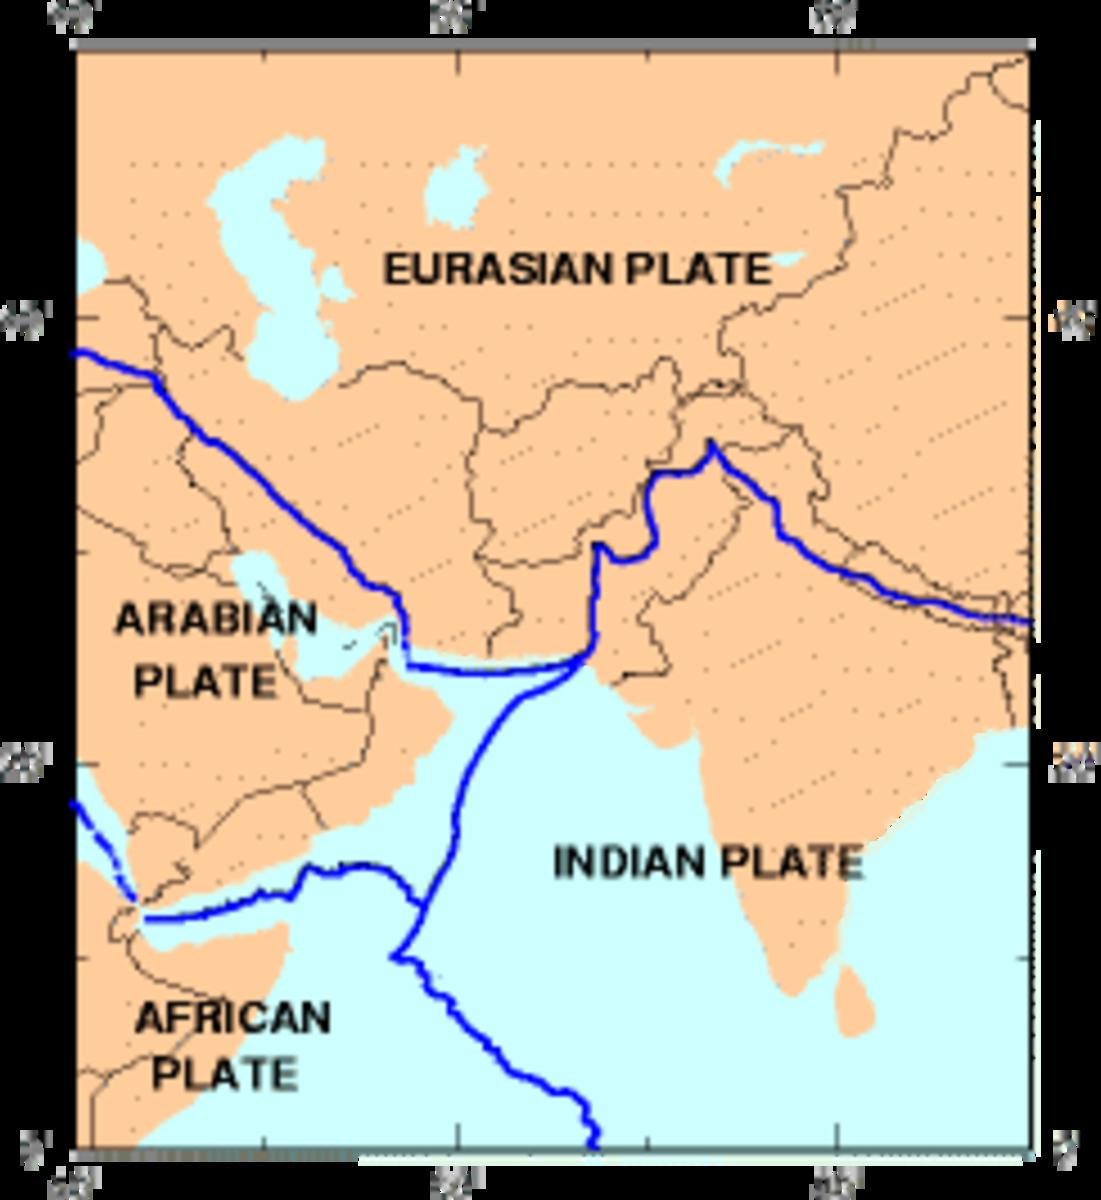 Tectonic plates. (Map: Public Domain)